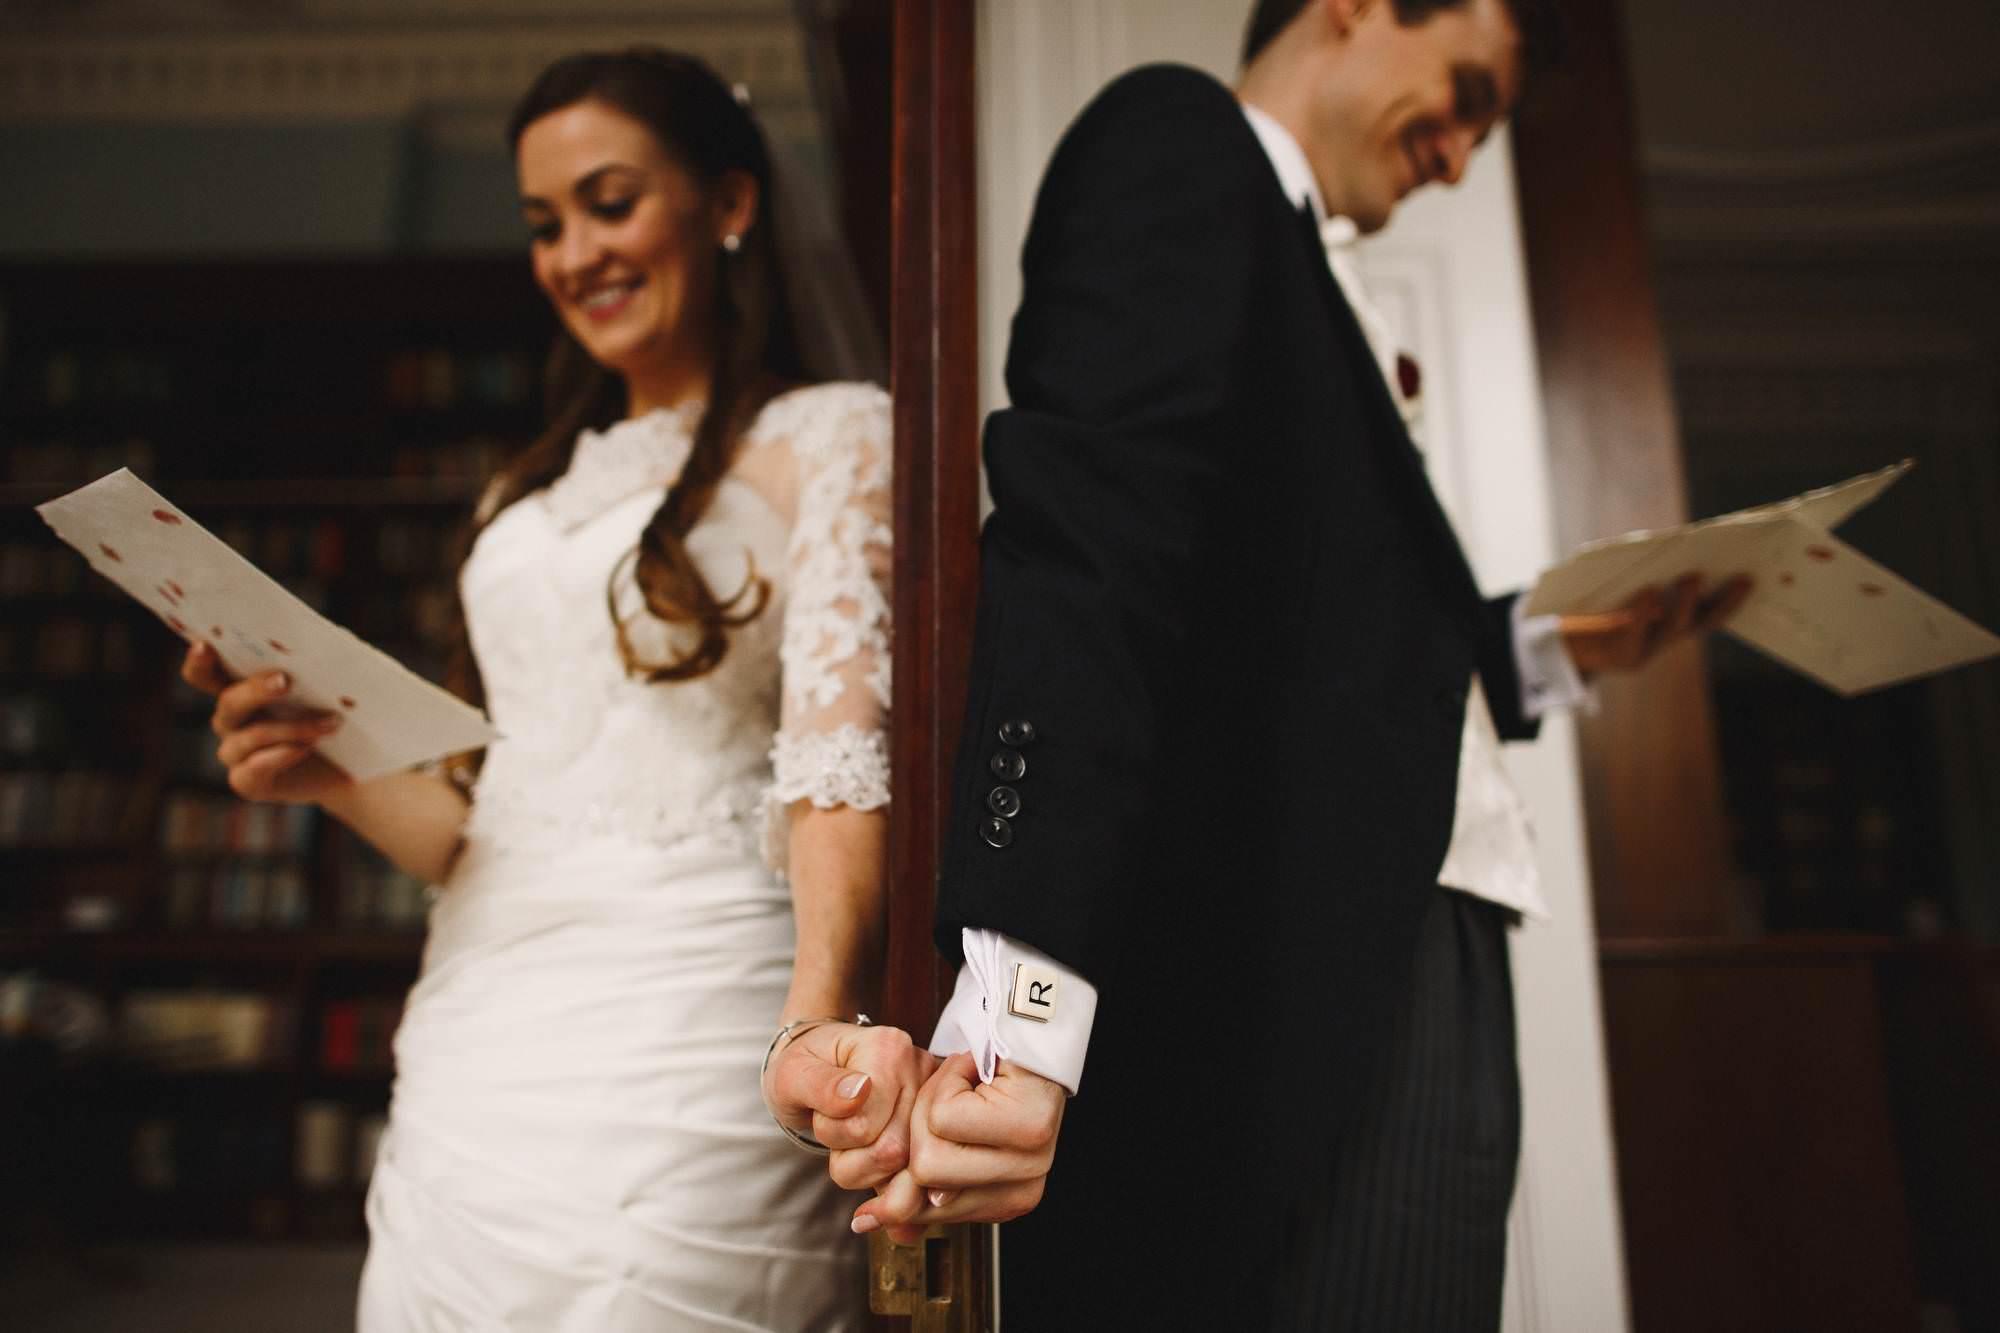 London wedding photography UK - Carlton House Terrace